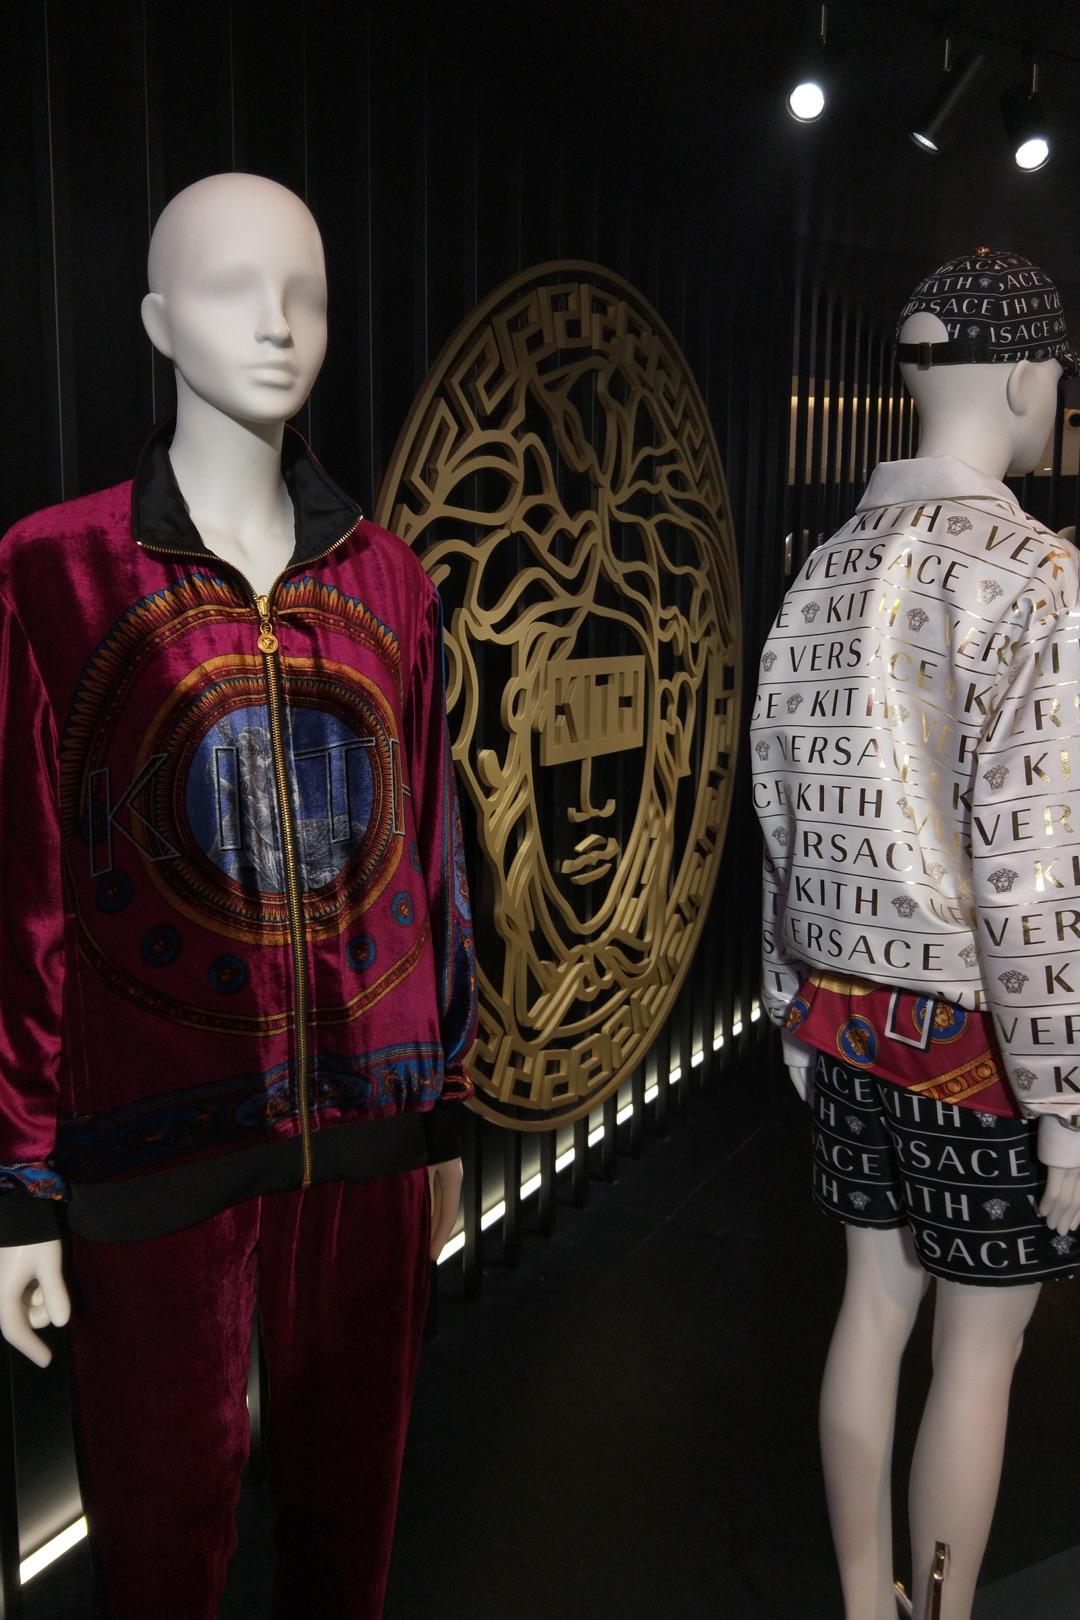 kith versace shanghai bespoke mannequins